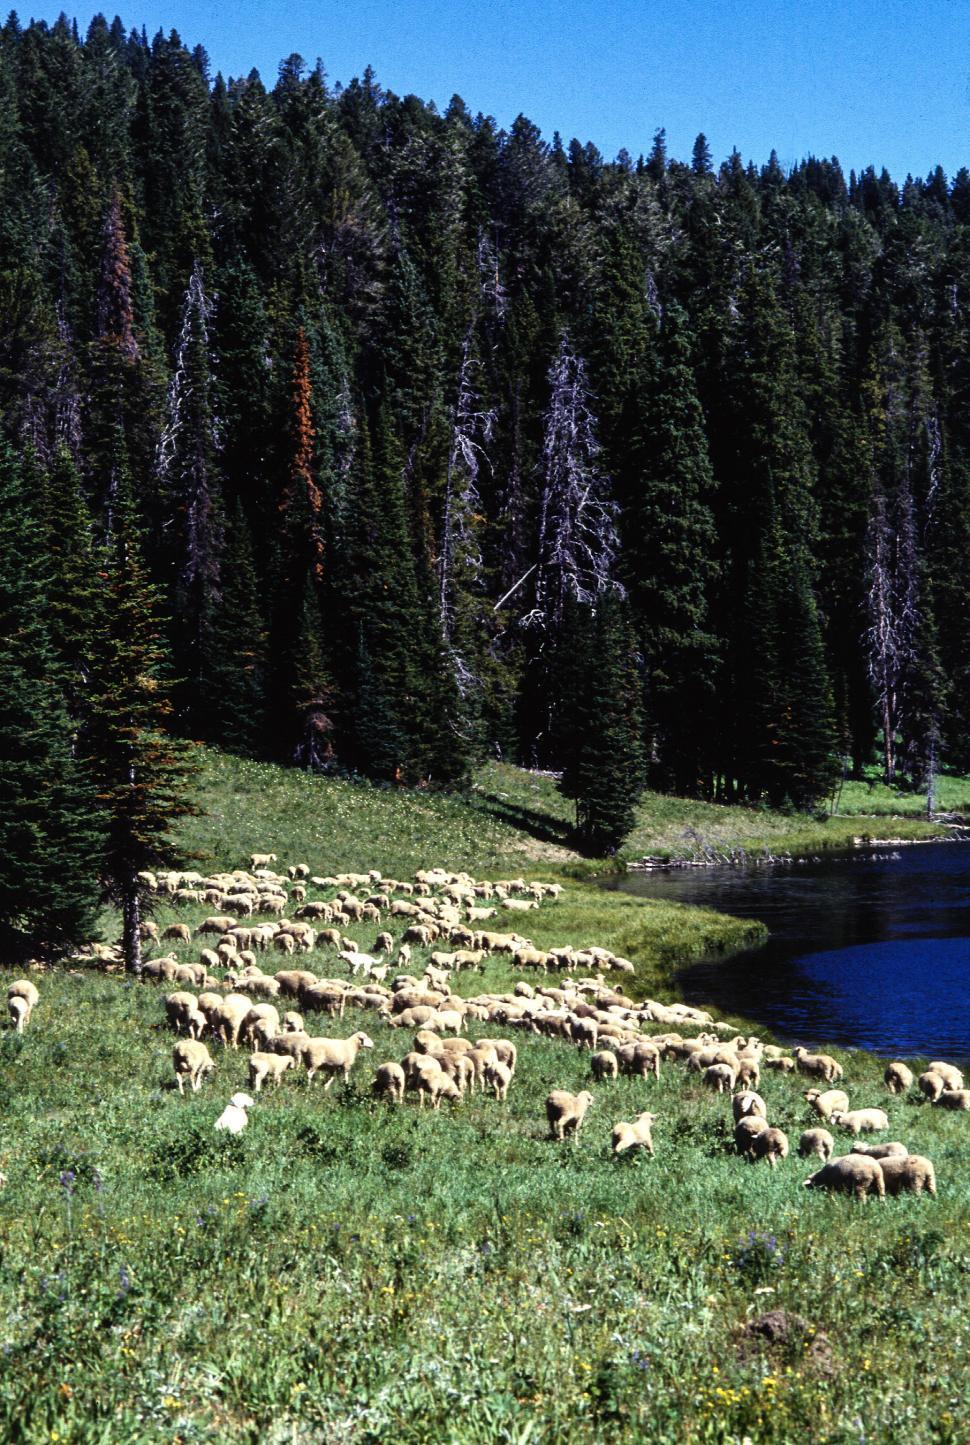 Download Free Stock HD Photo of Sheep Graze Online